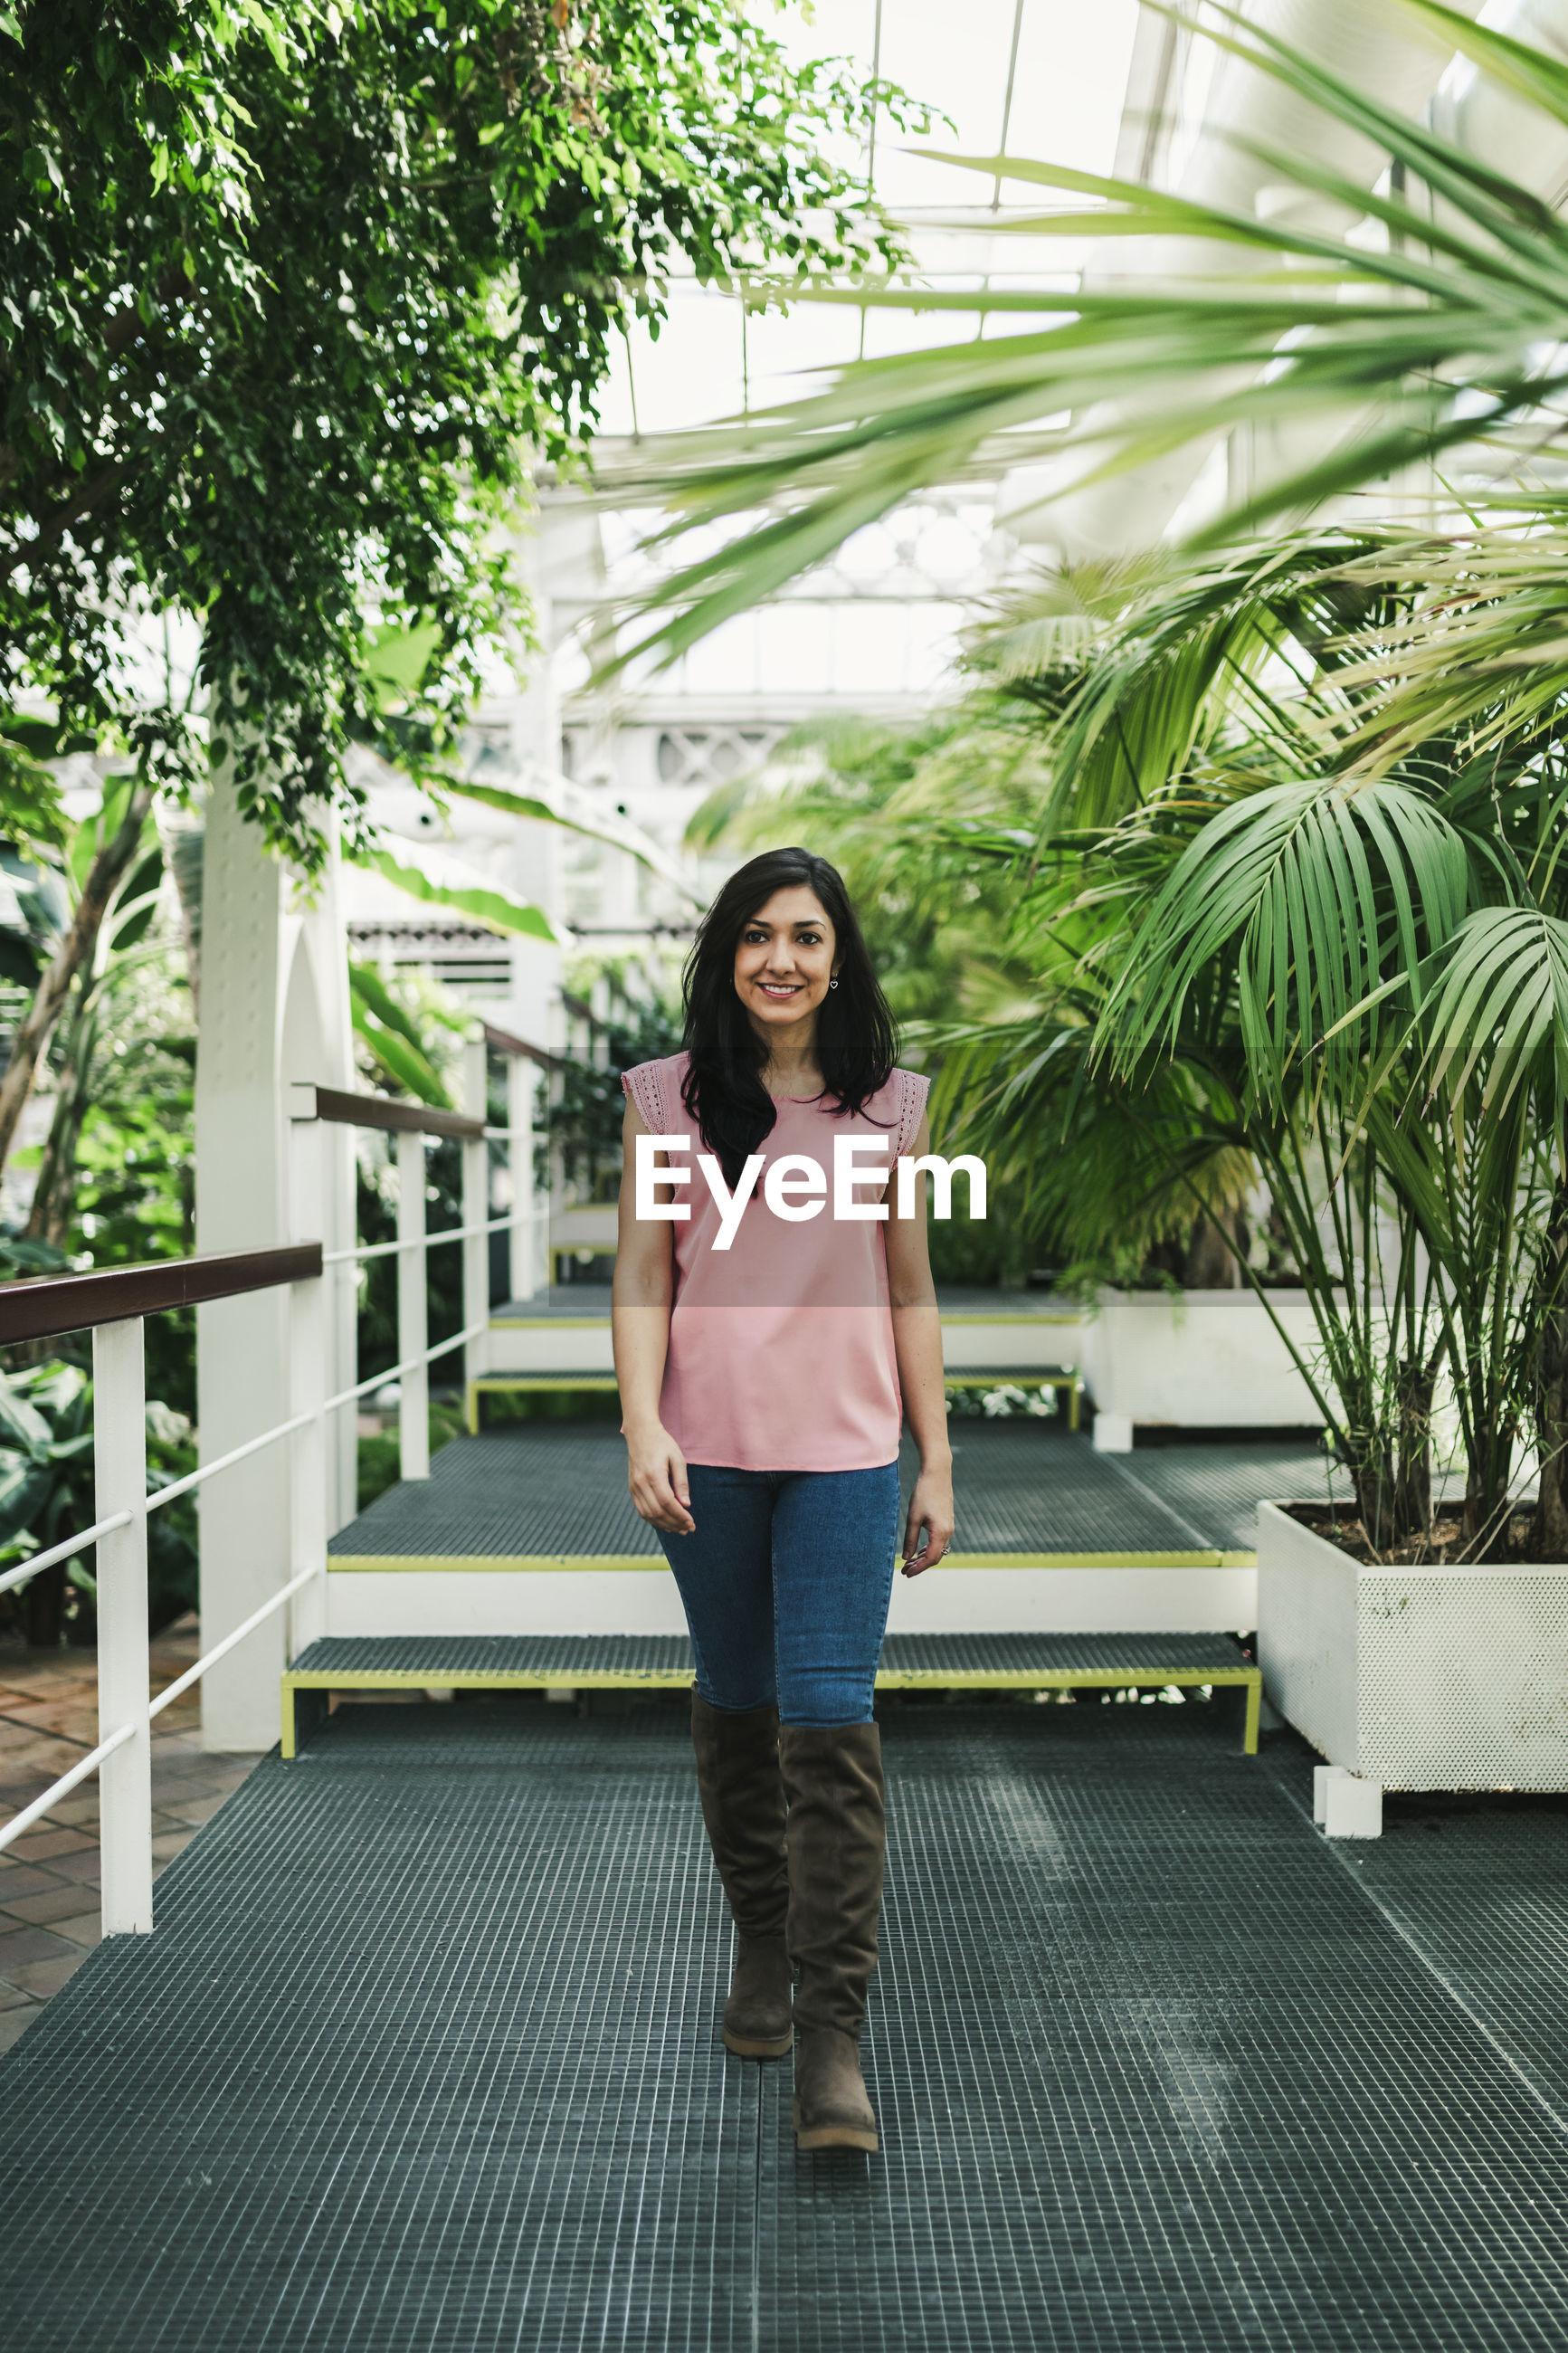 FULL LENGTH PORTRAIT OF WOMAN STANDING AGAINST PLANTS